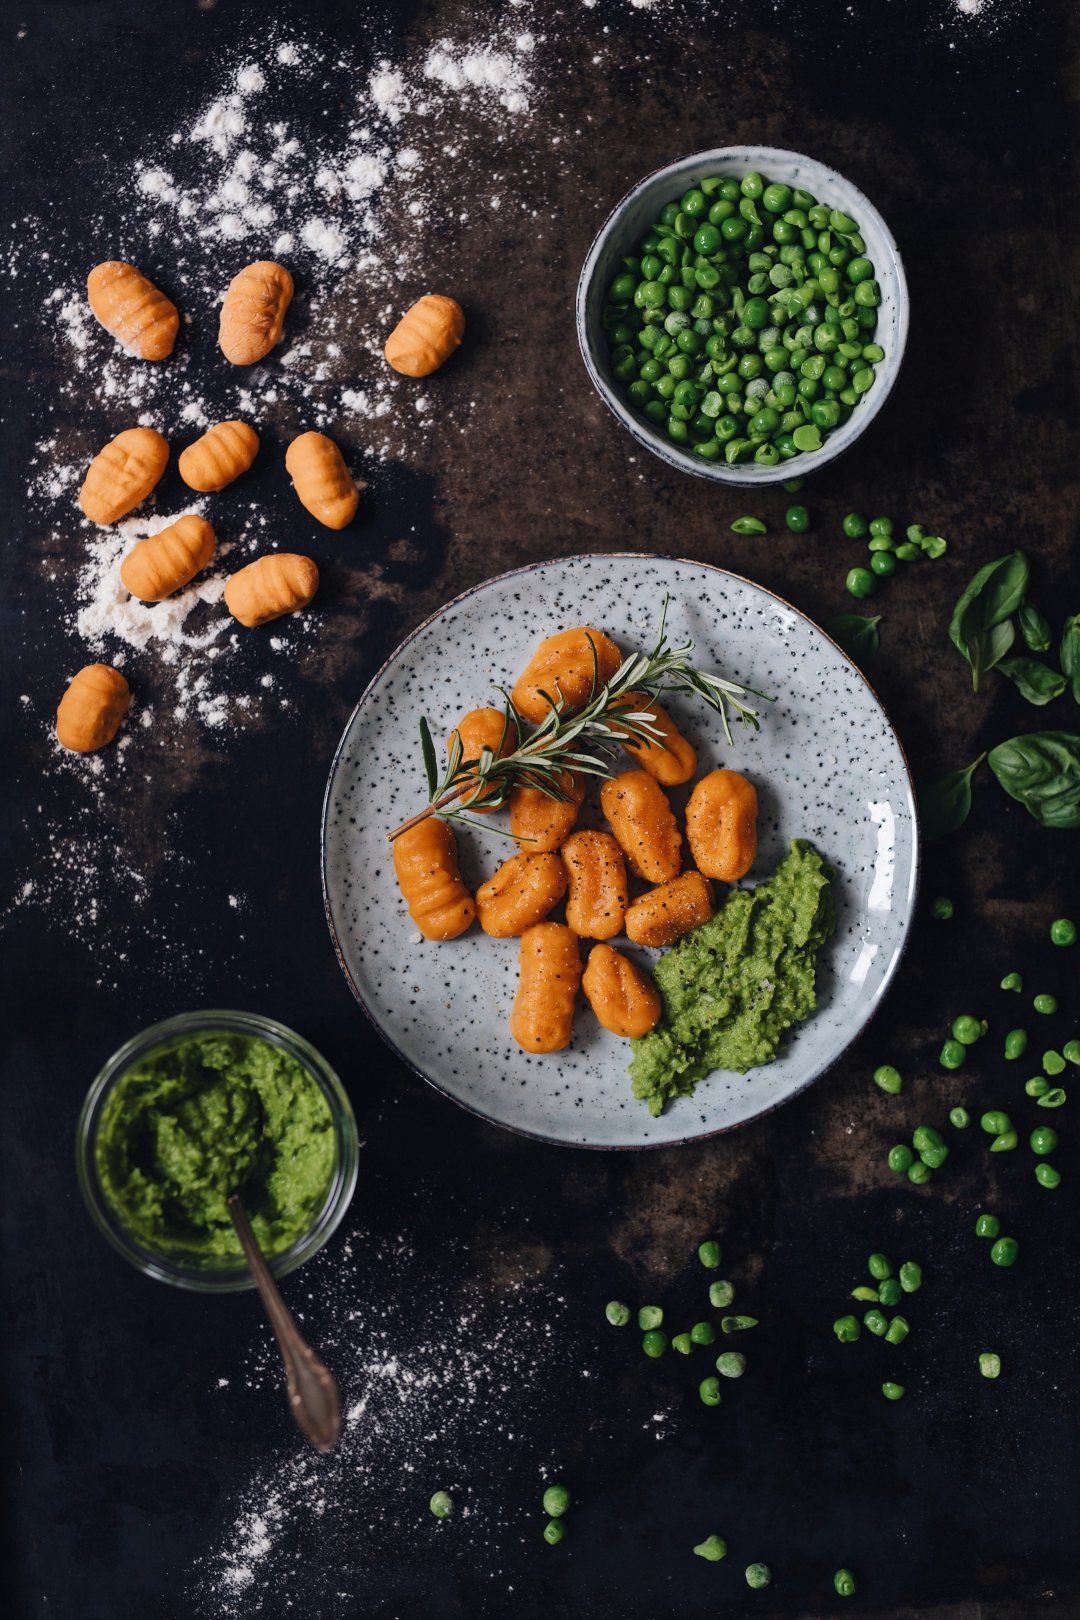 Selbstgemachte vegane Süßkartoffel Gnocchi Erbsen-Basilikum-Pesto